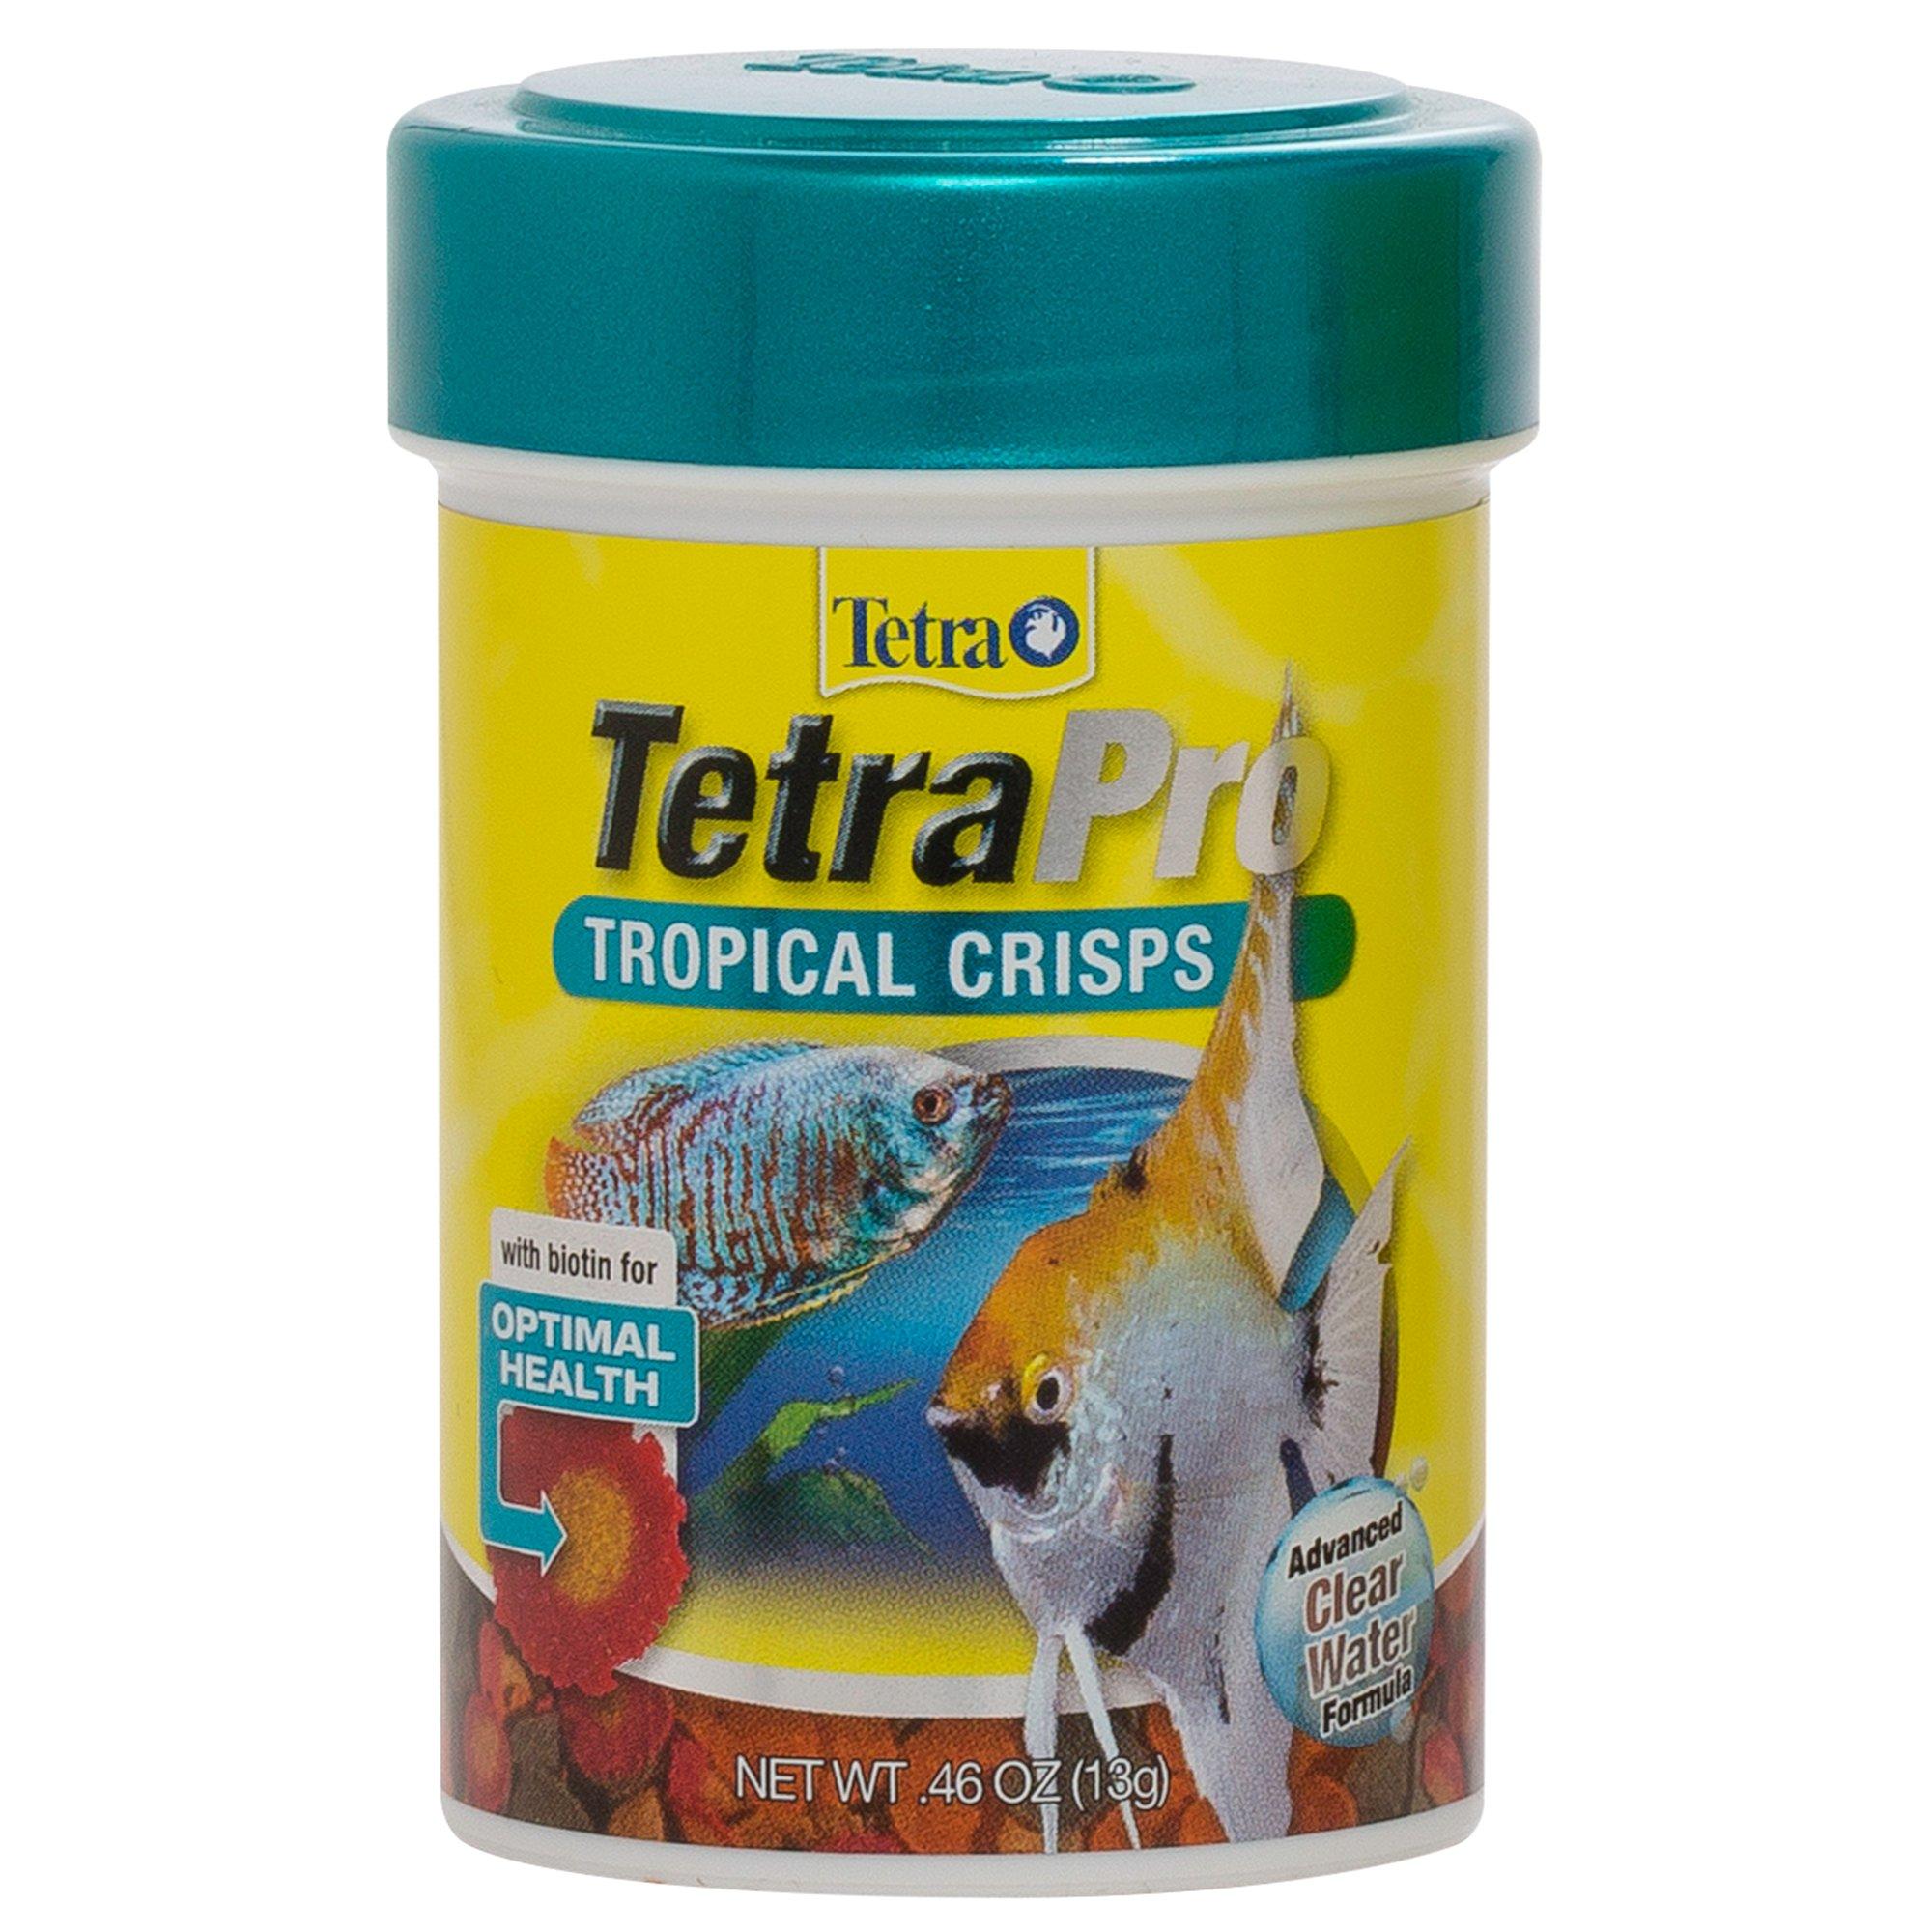 Tetra pro tropical food 46 oz petco for Petco fish food